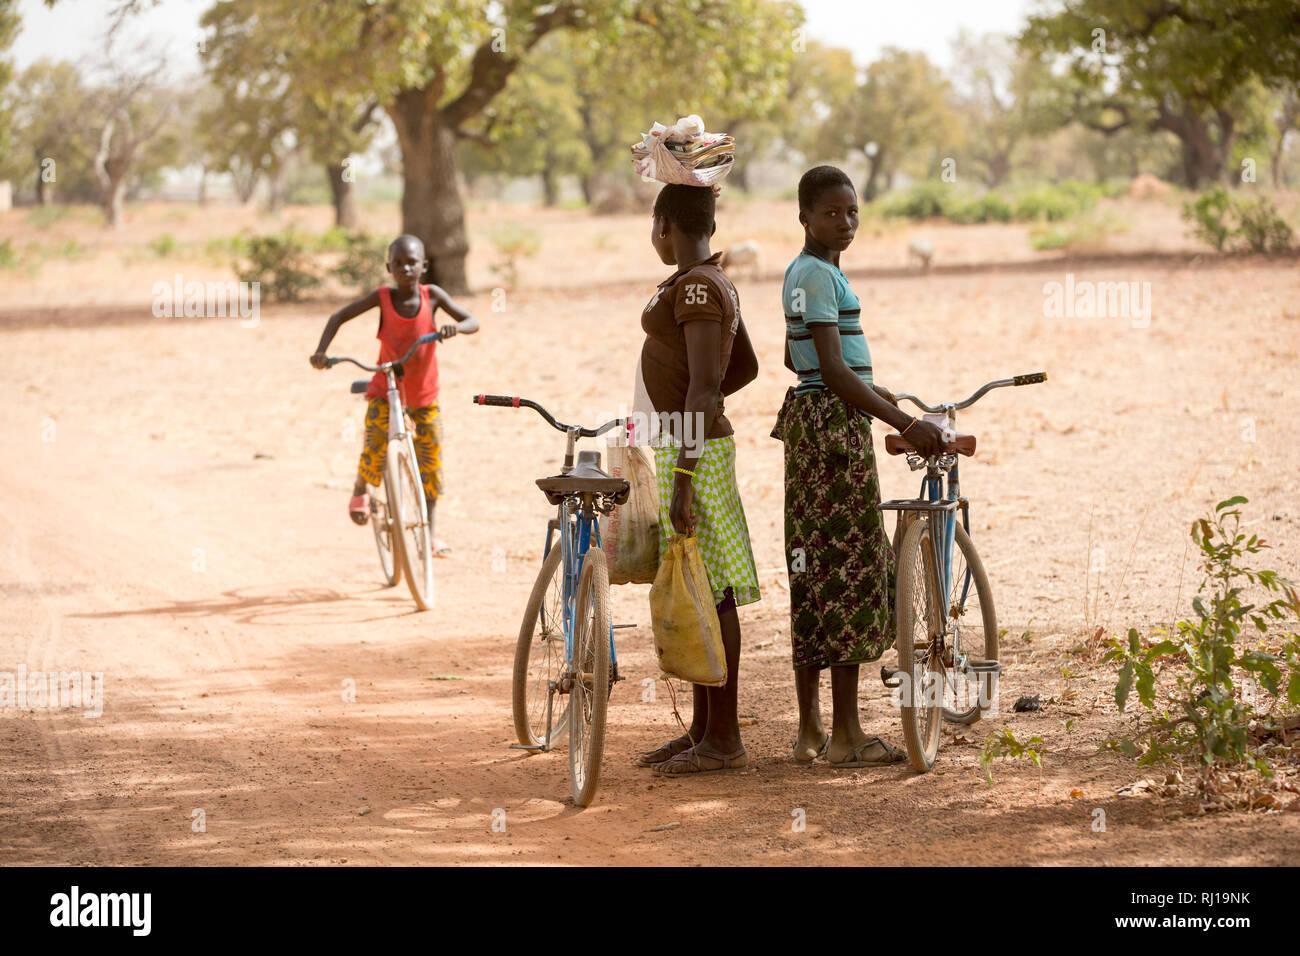 Samba village, Yako Province, Burkina Faso; schoolgirls on their way home from school wait in the shade for a friend. Stock Photo